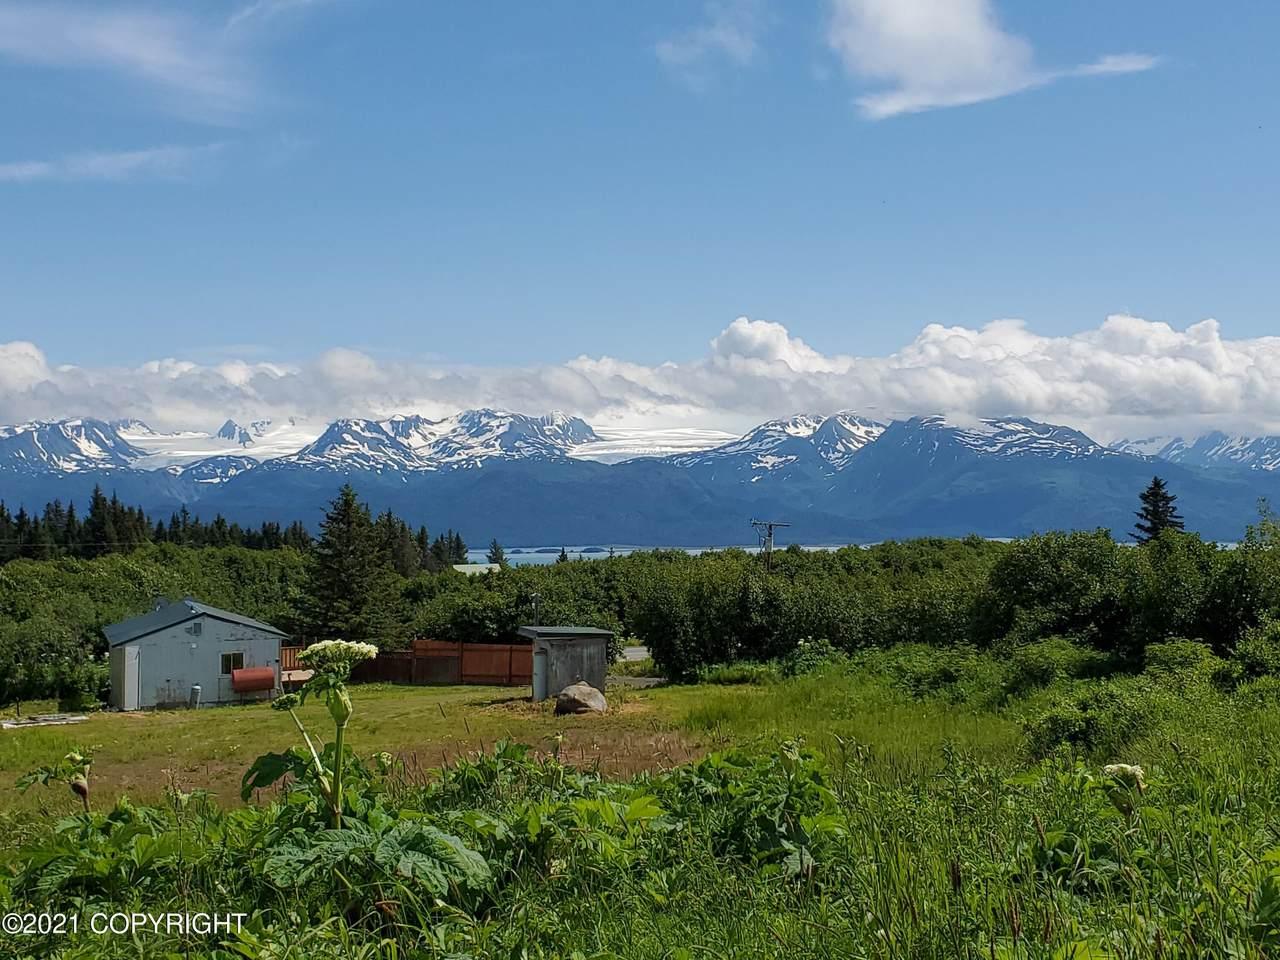 https://bt-photos.global.ssl.fastly.net/alaska/1280_boomver_4_21-6772-2.jpg